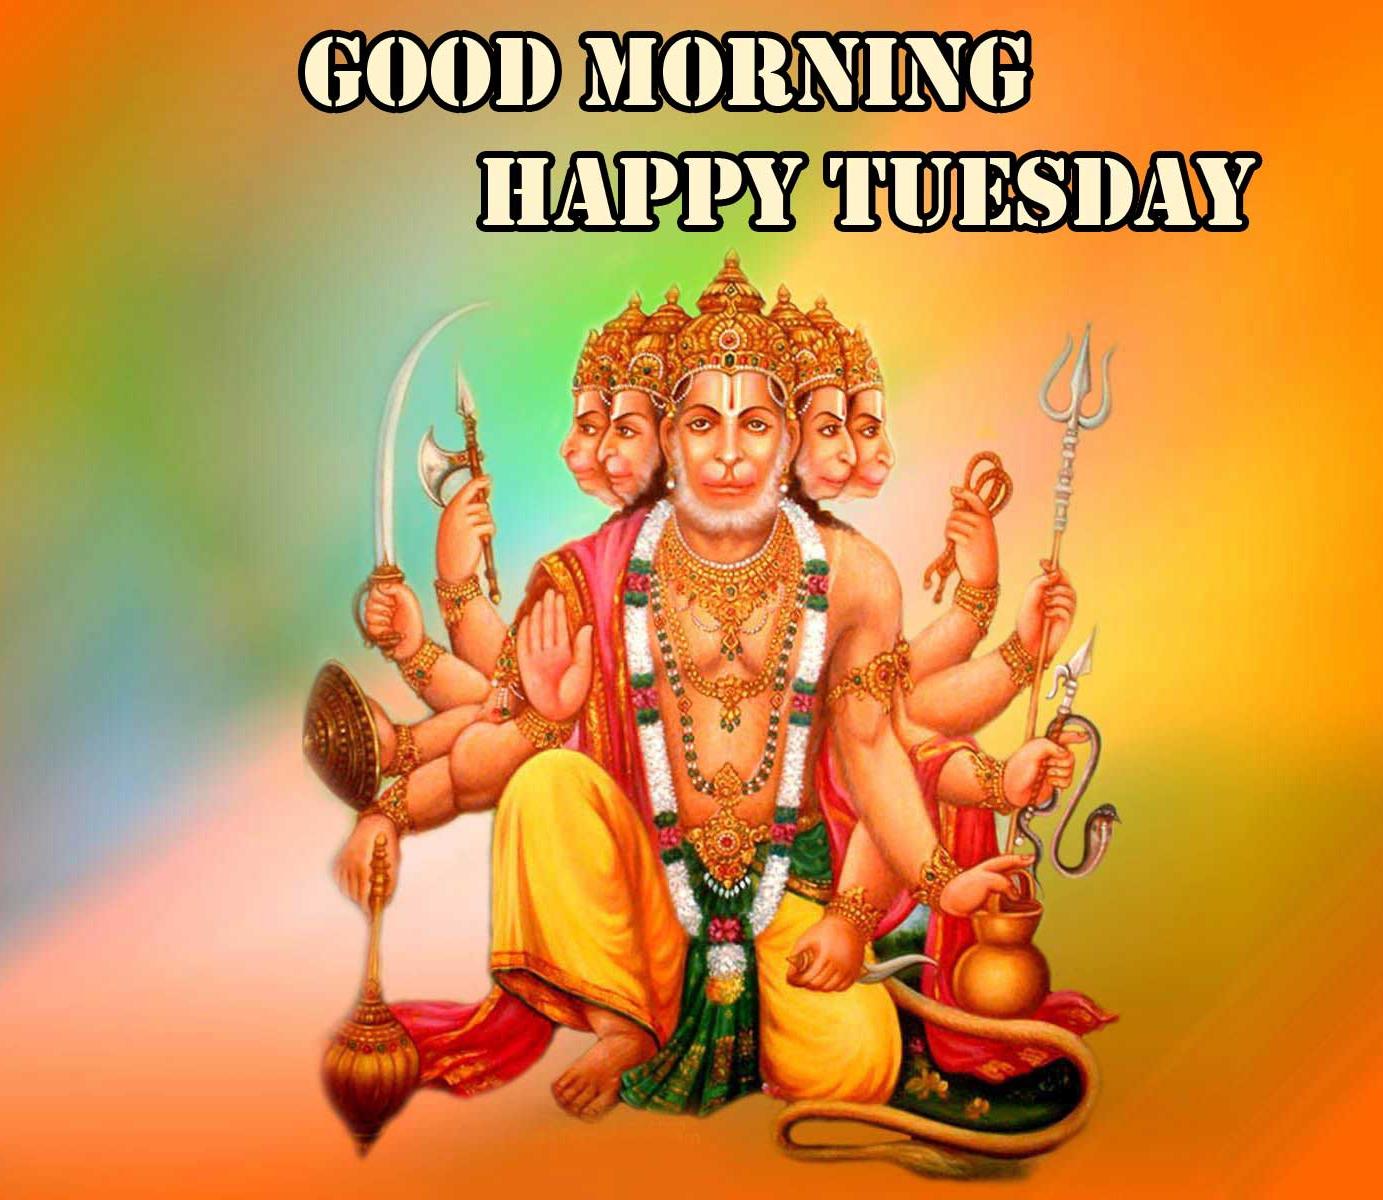 new Best Free Good Morning Tuesday Hauman JI Images Pics Download